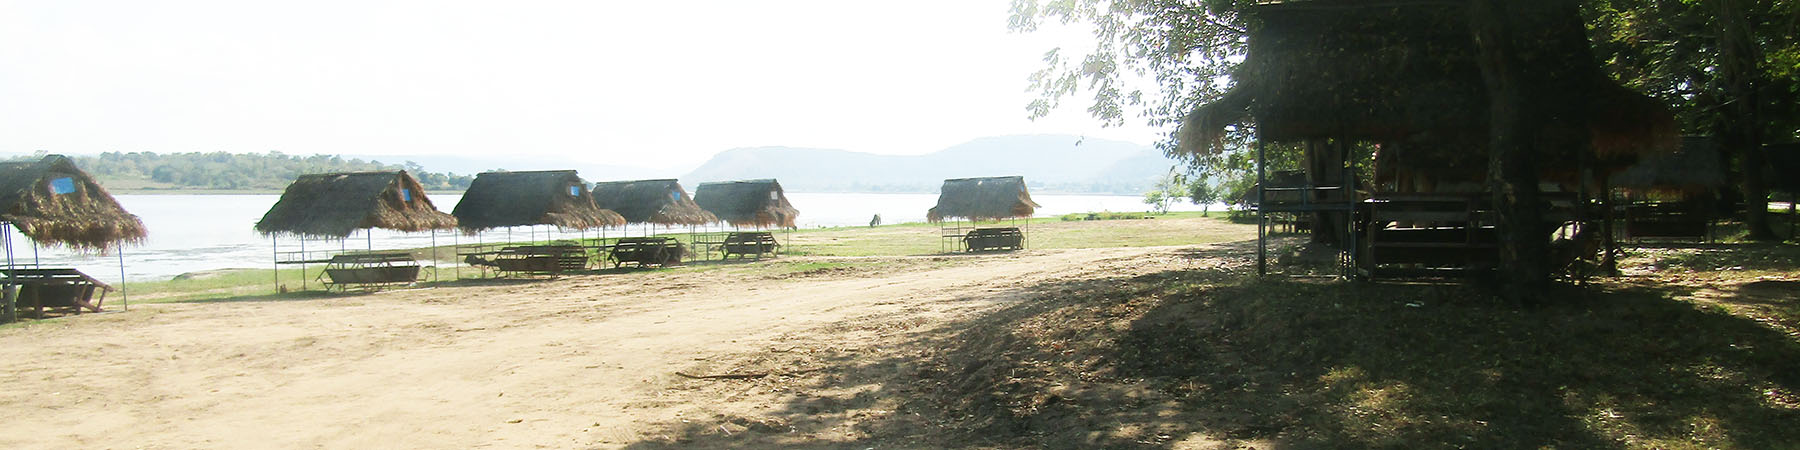 Sufpadoo Reservoir, Sihkio District, Nakhon Ratchasima Province